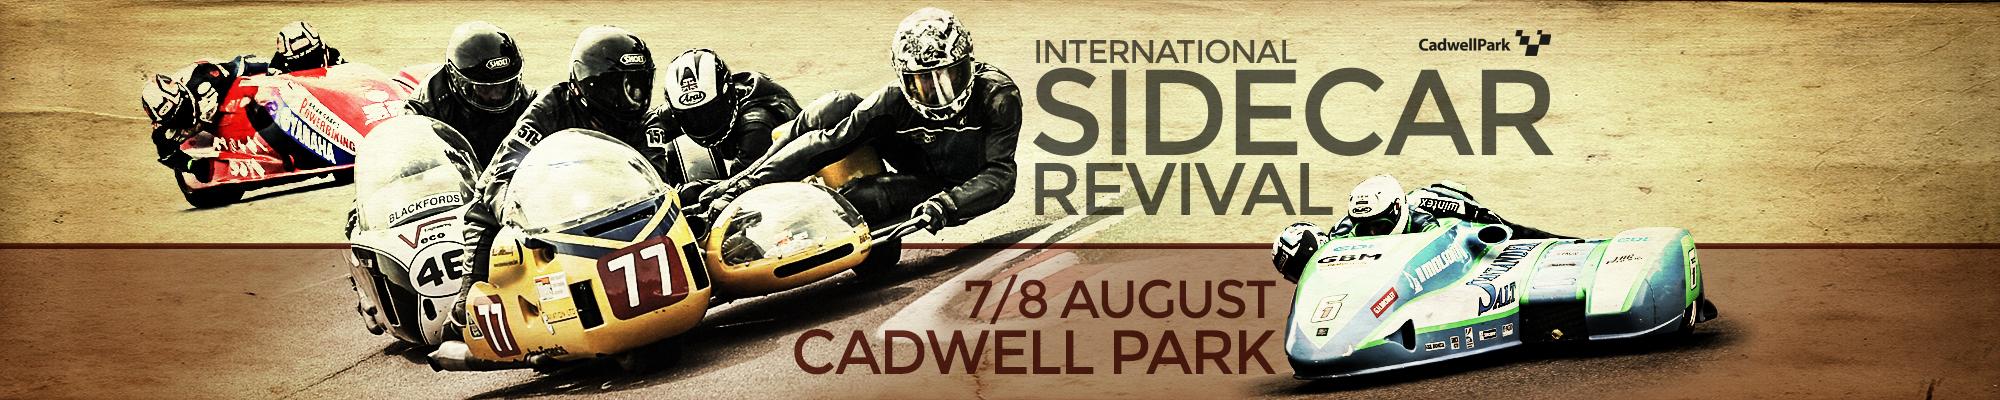 BMCRC International Sidecar Revival